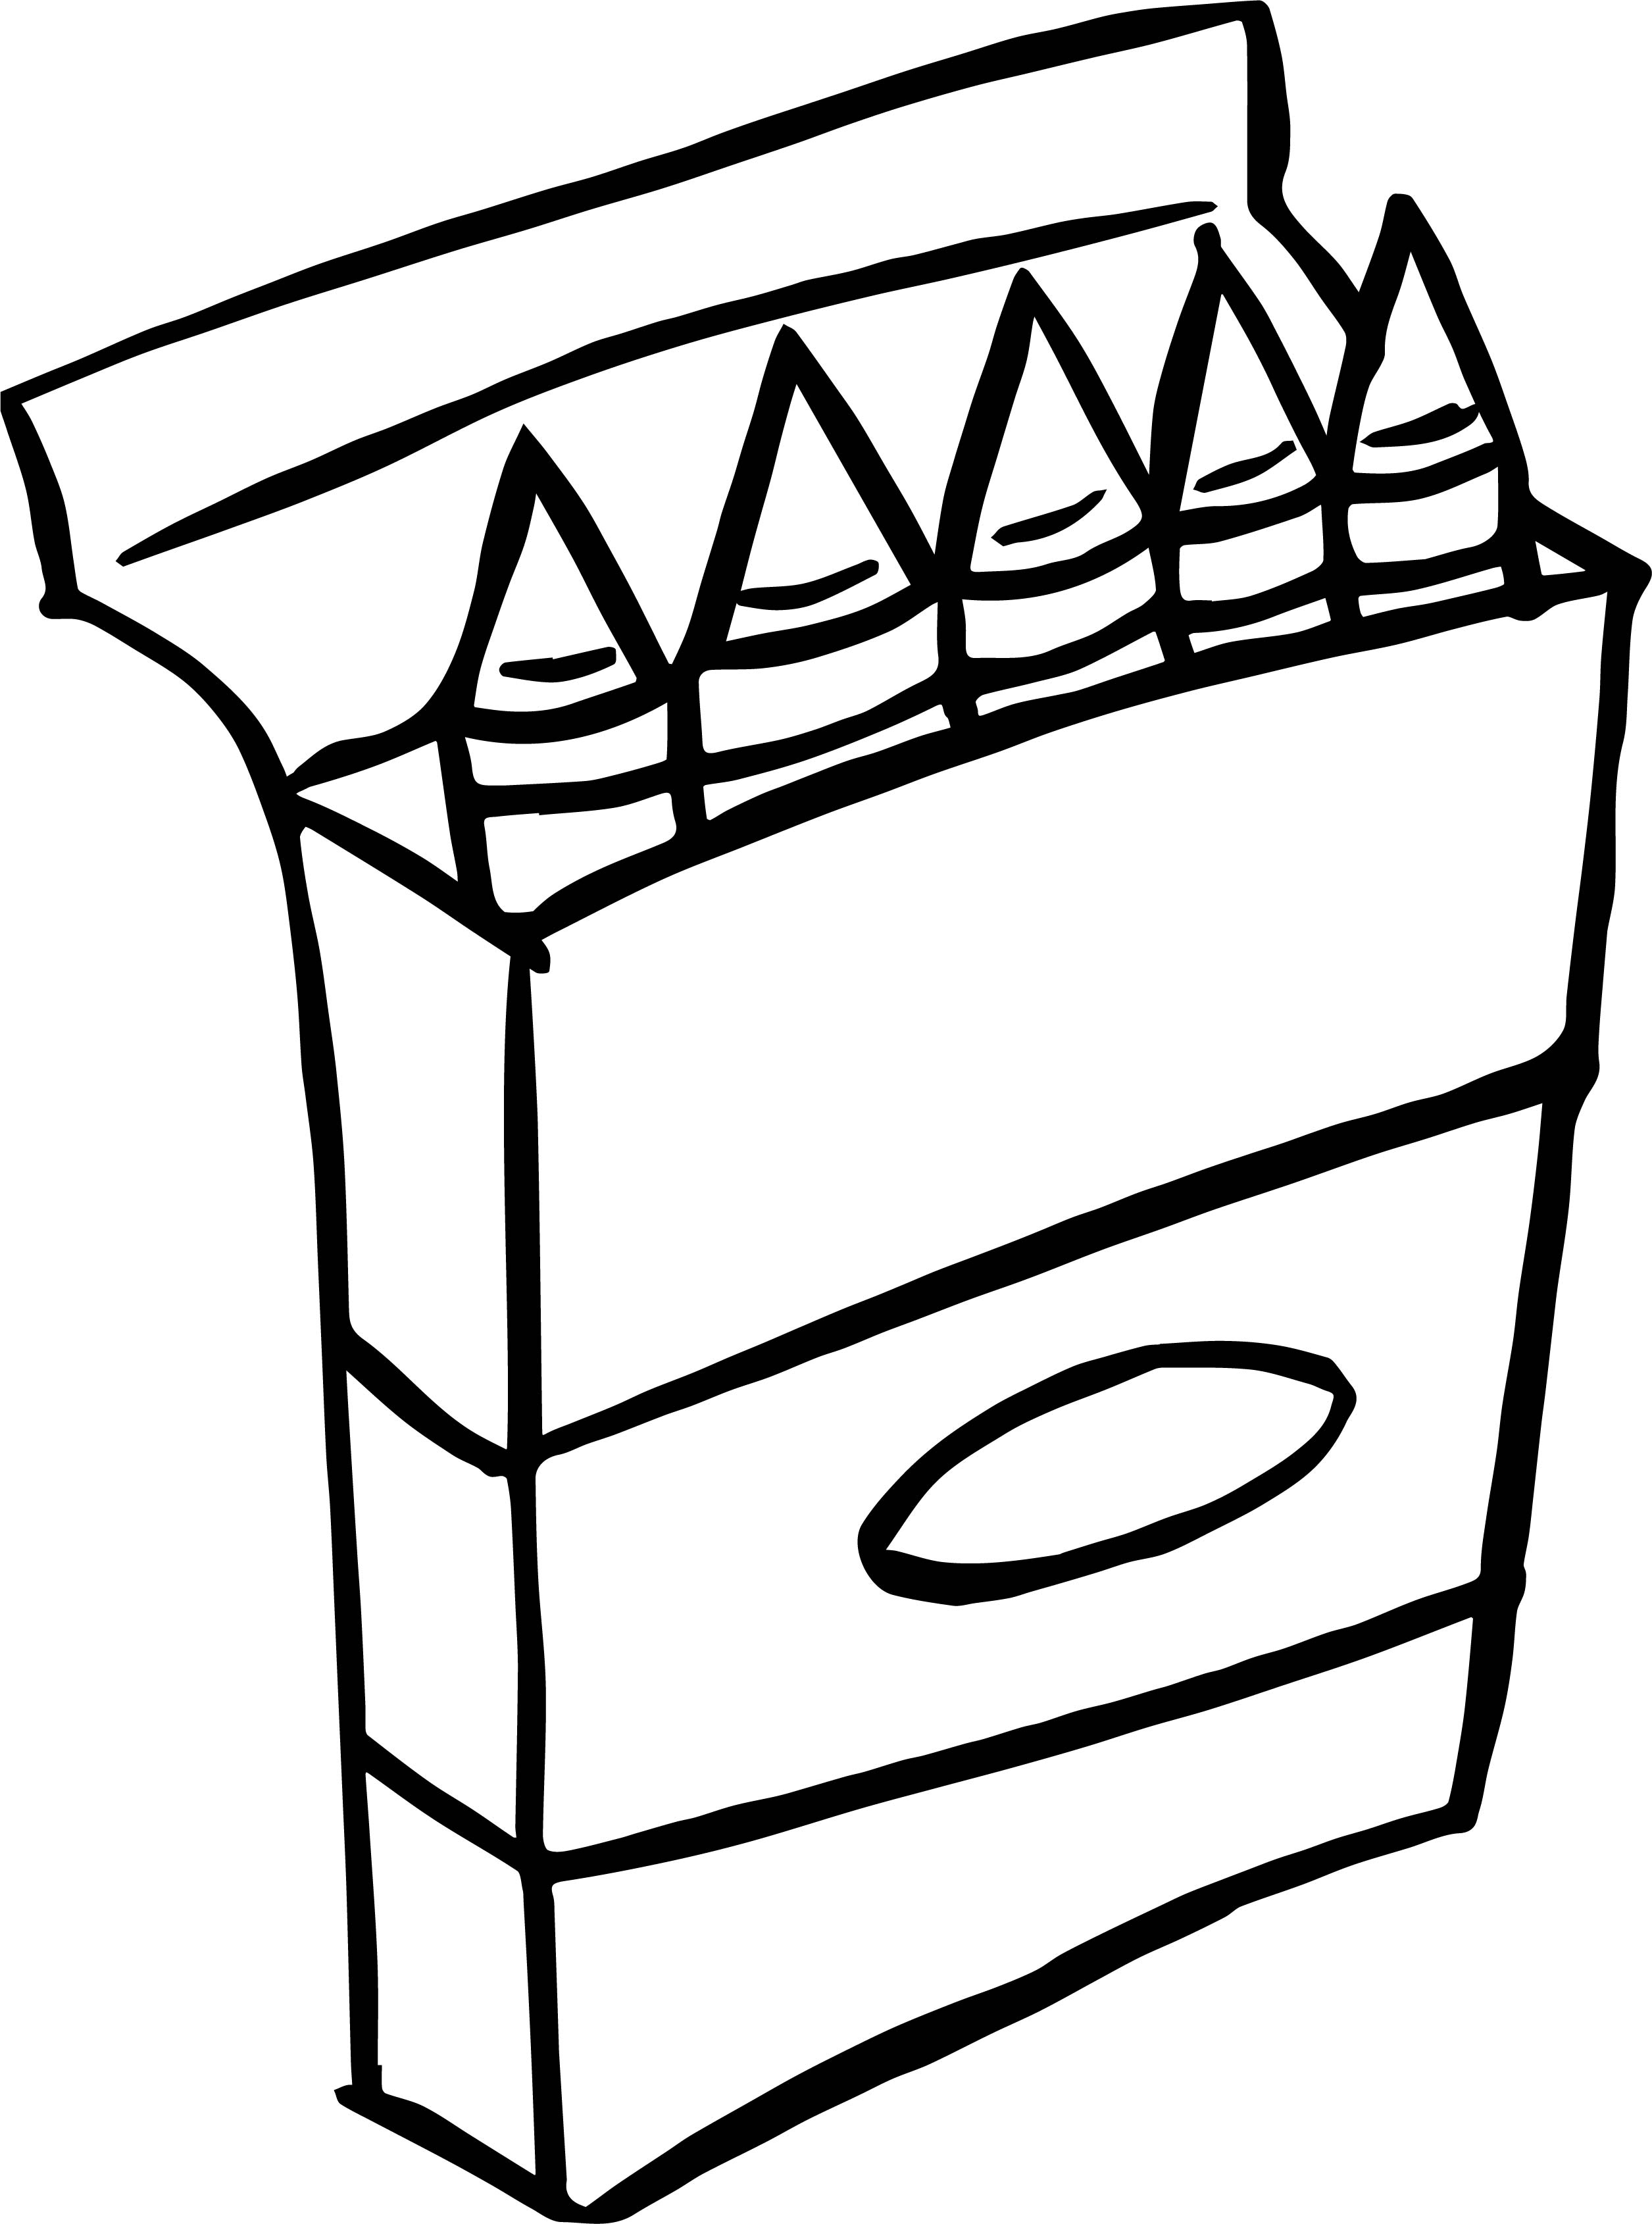 2511x3380 Crayon Box Coloring Page Wecoloringpage